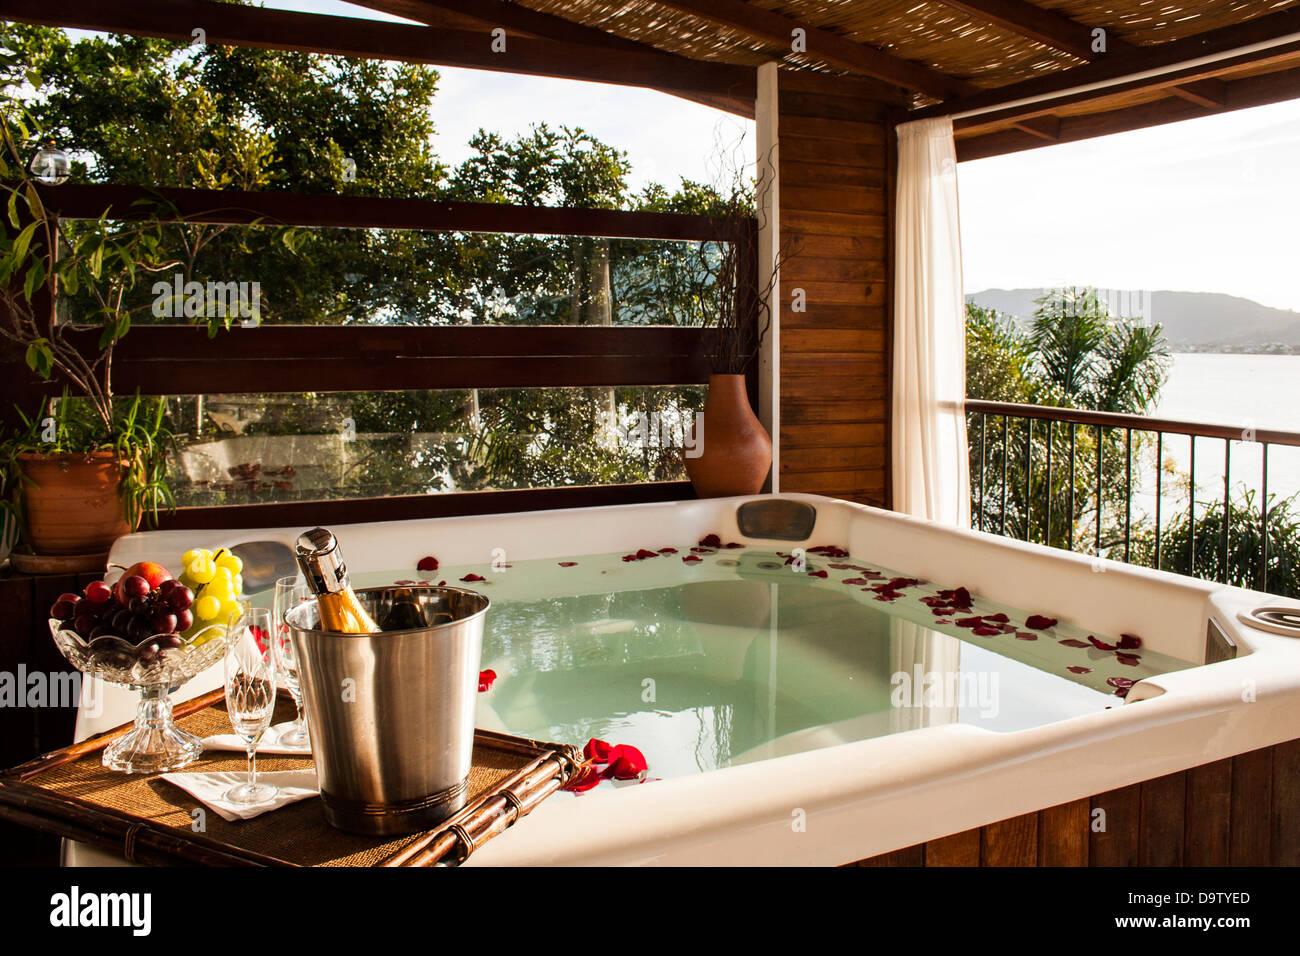 Vasca Da Bagno In Camera : Vasca da bagno in camera balcone di isadora duncan guest house foto